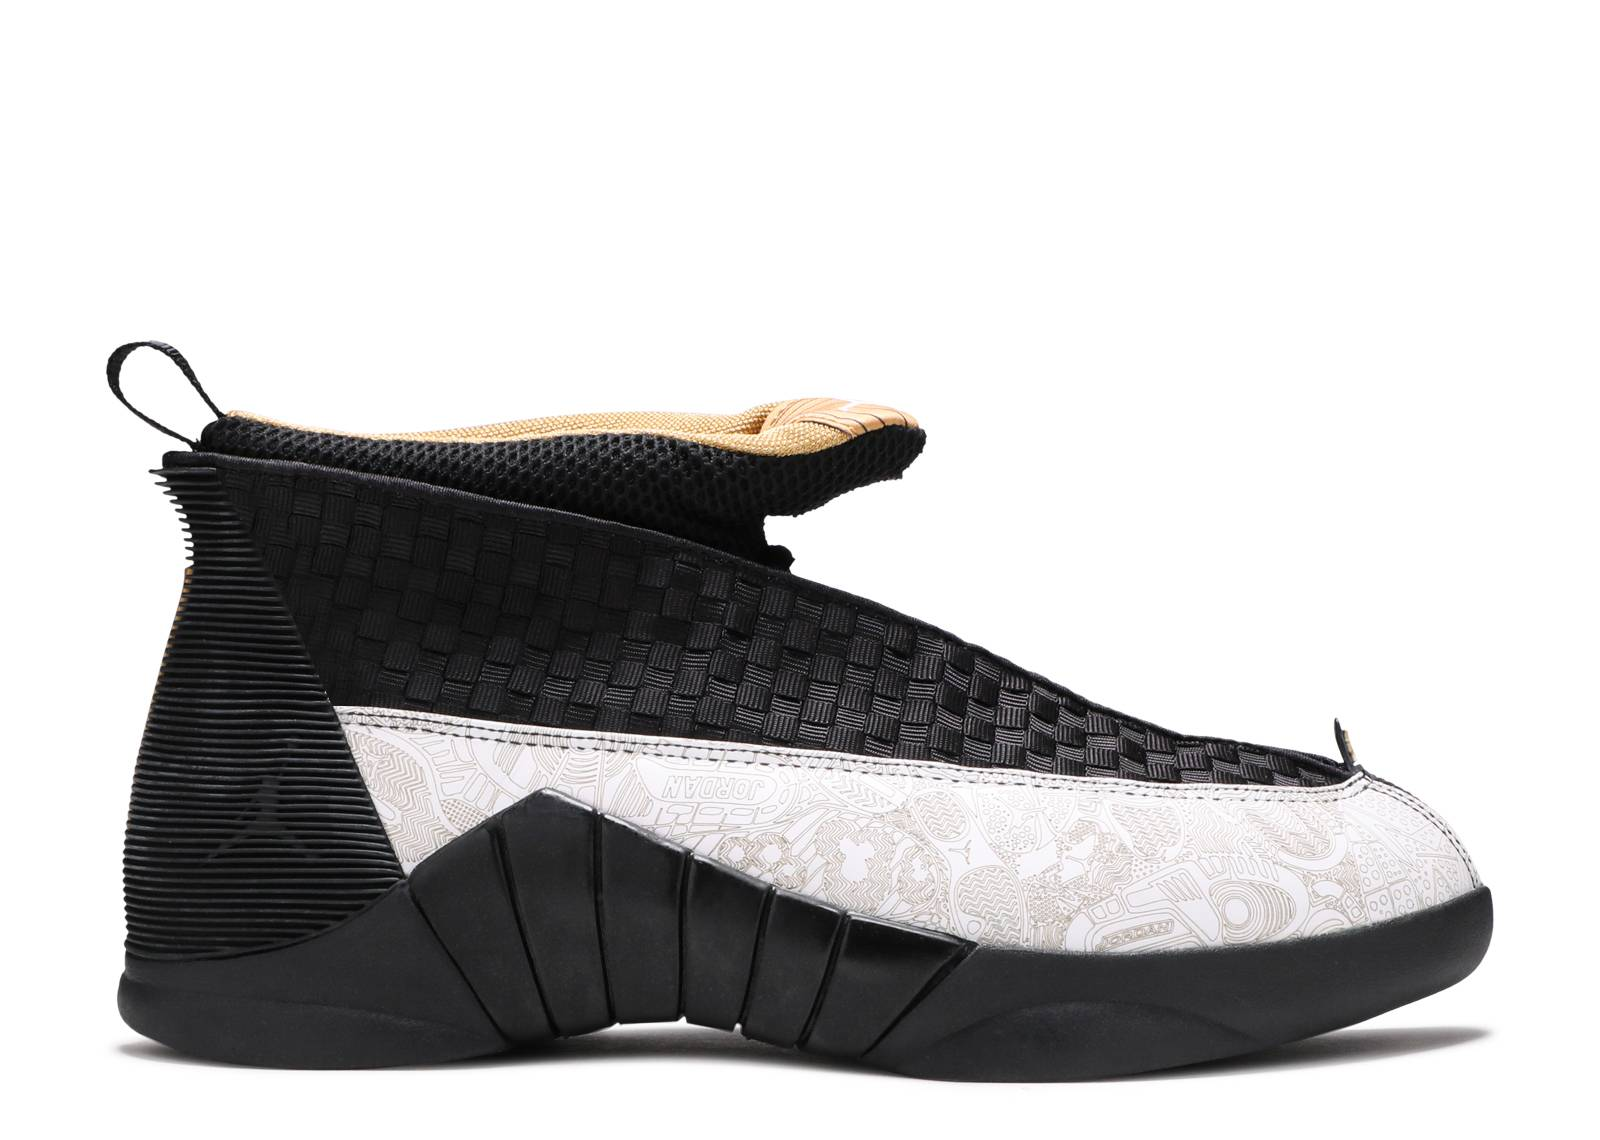 Nike Jordan 15